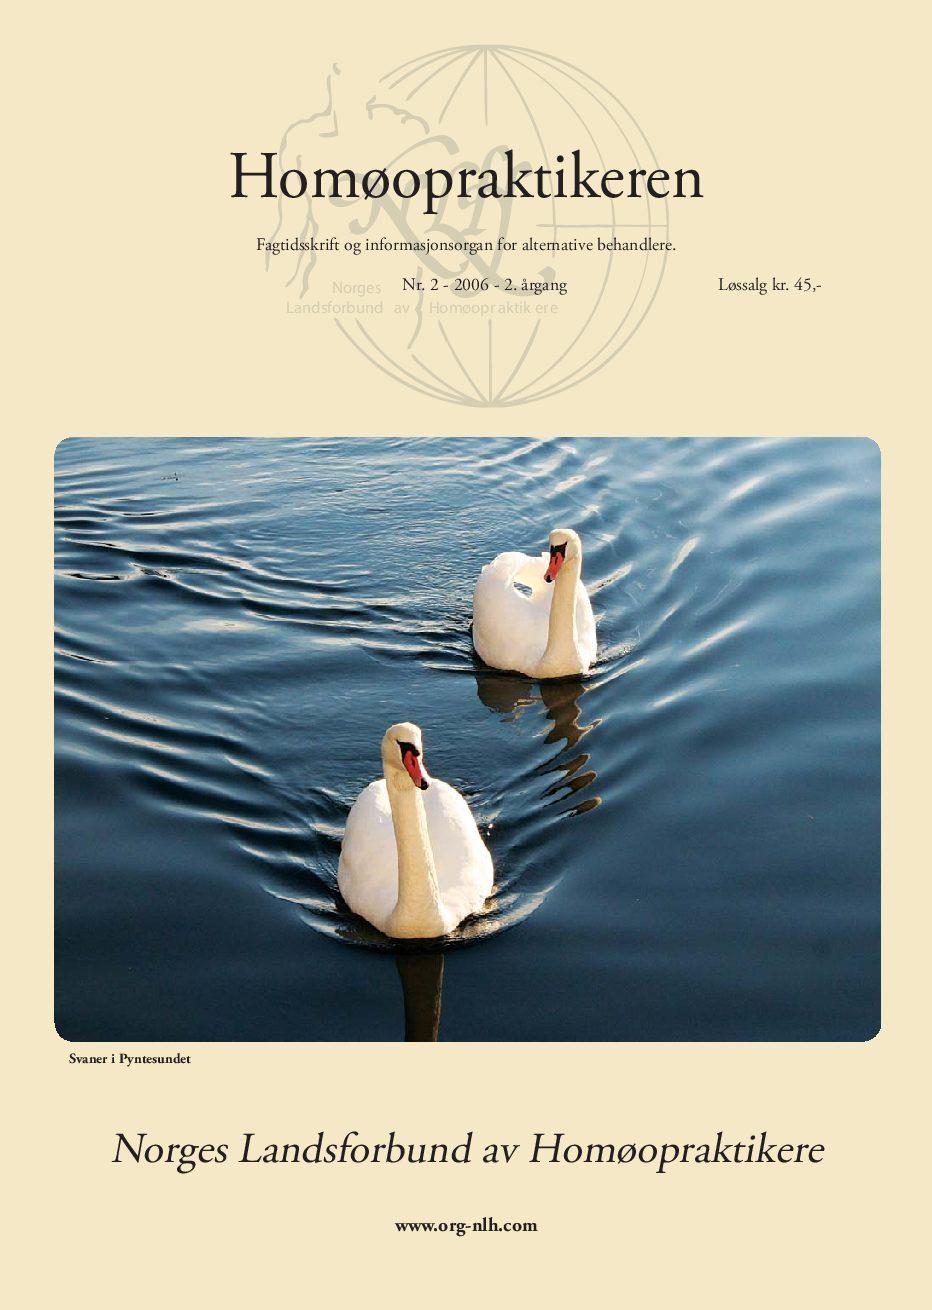 Homøopraktikeren nr. 2-2006